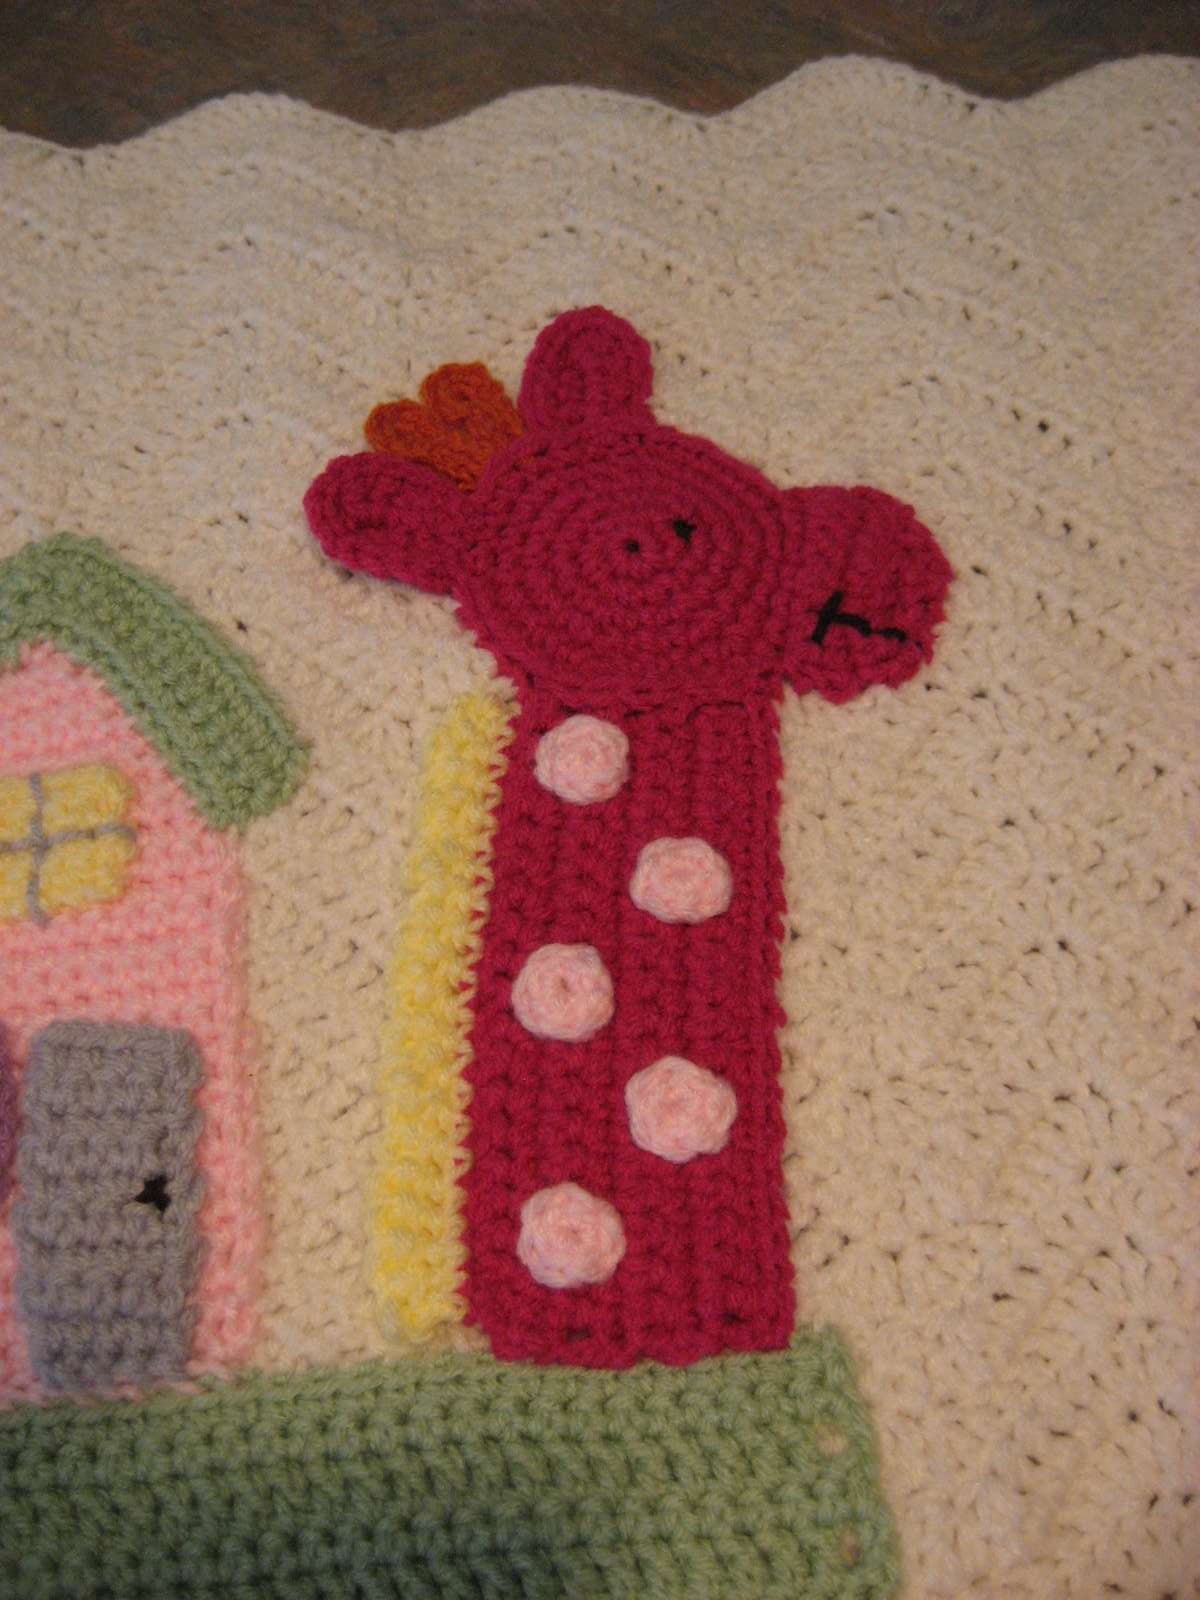 Hooked on Needles: Crocheted Noah's Ark Blanket ~ Finished!